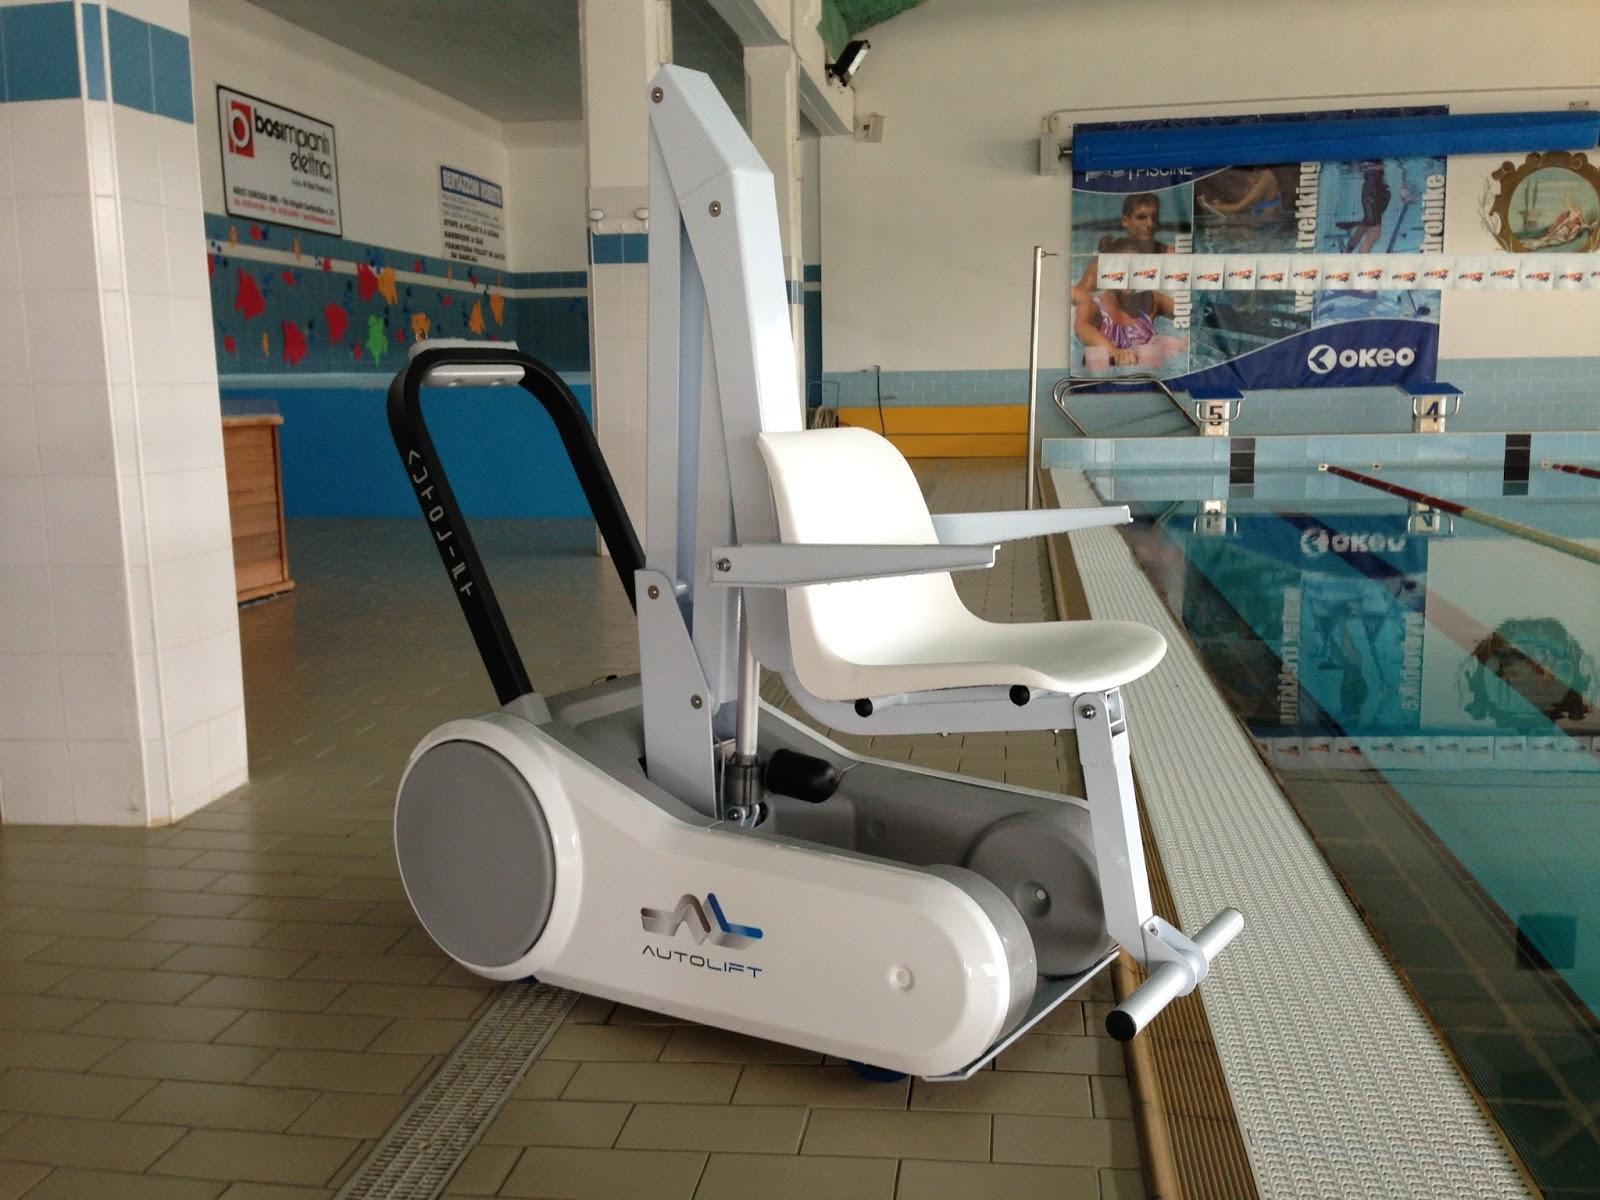 Sollevatori Mobili Per Piscina : Sollevatore per vasche la piscina è per tutti